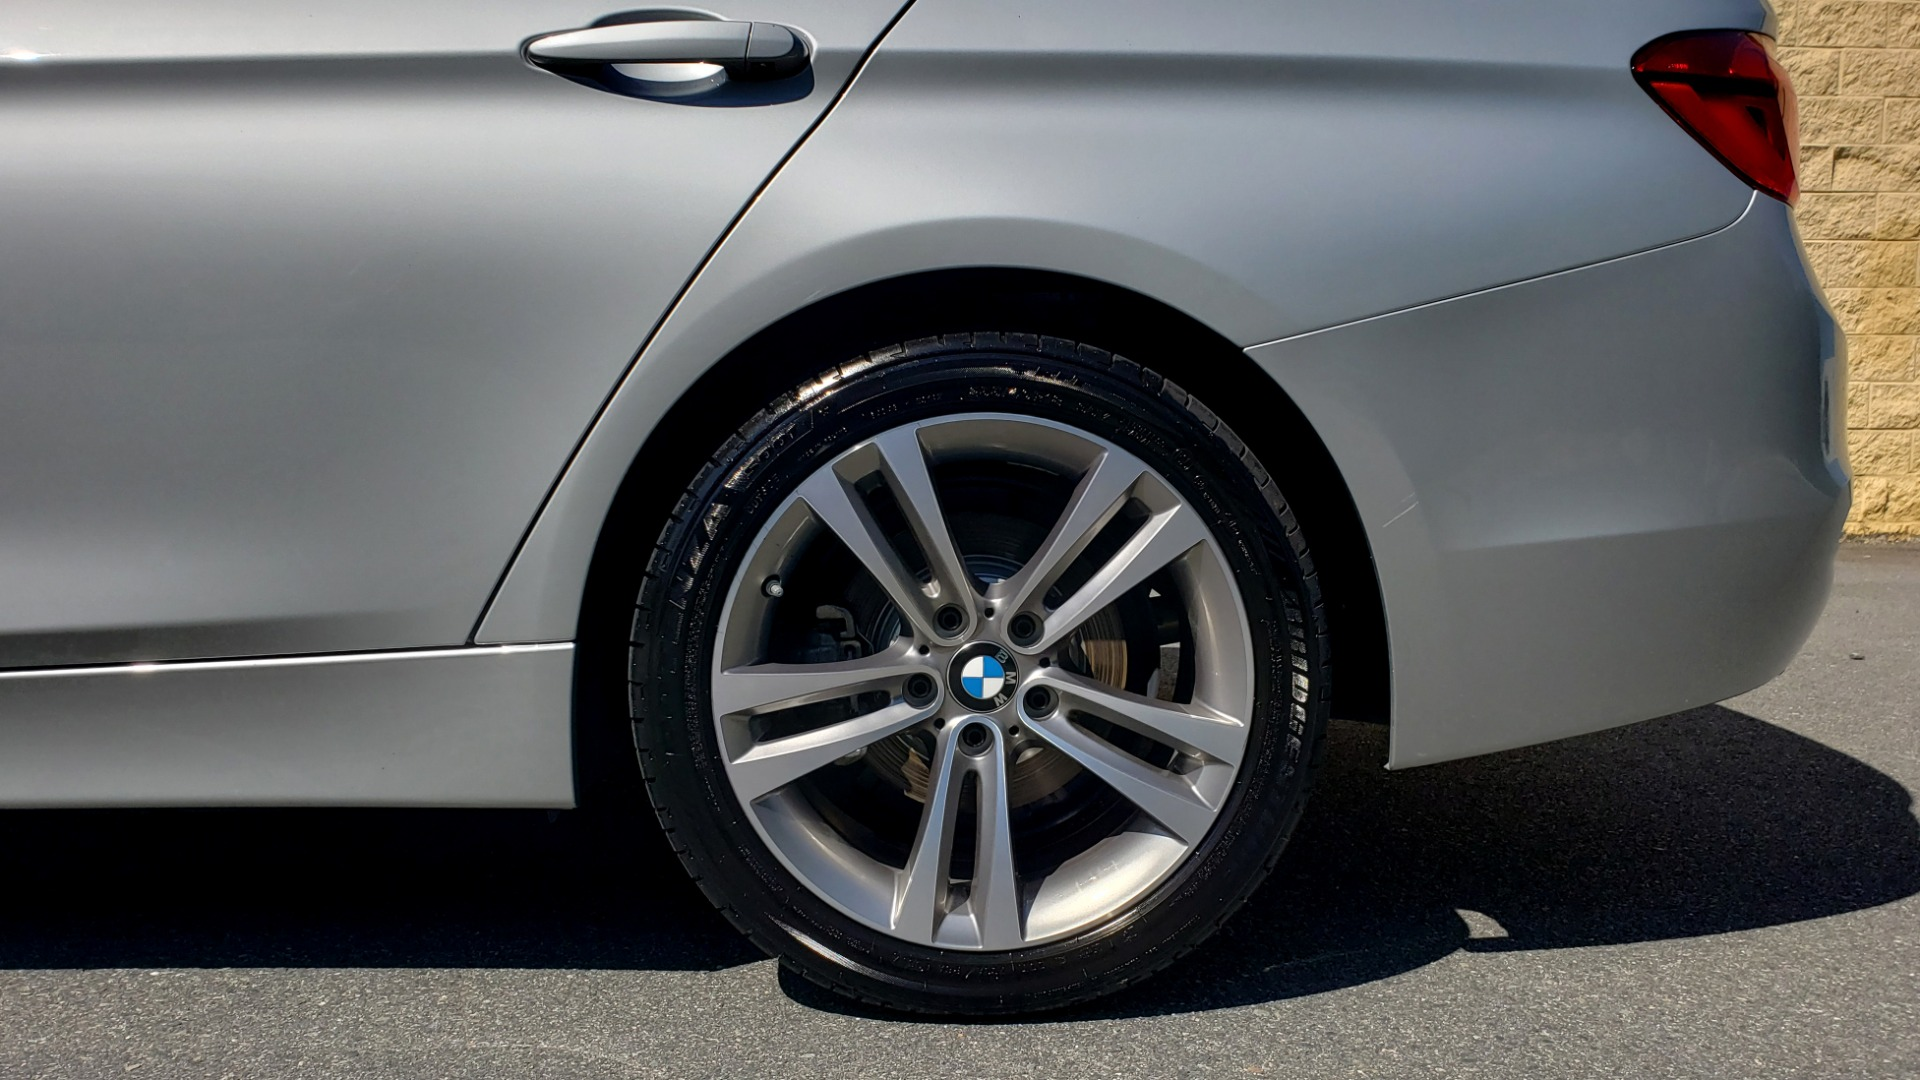 Used 2017 BMW 3 SERIES 330I SPORT SEDAN / DRVR ASST PKG / SUNROOF / REARVIEW for sale Sold at Formula Imports in Charlotte NC 28227 77